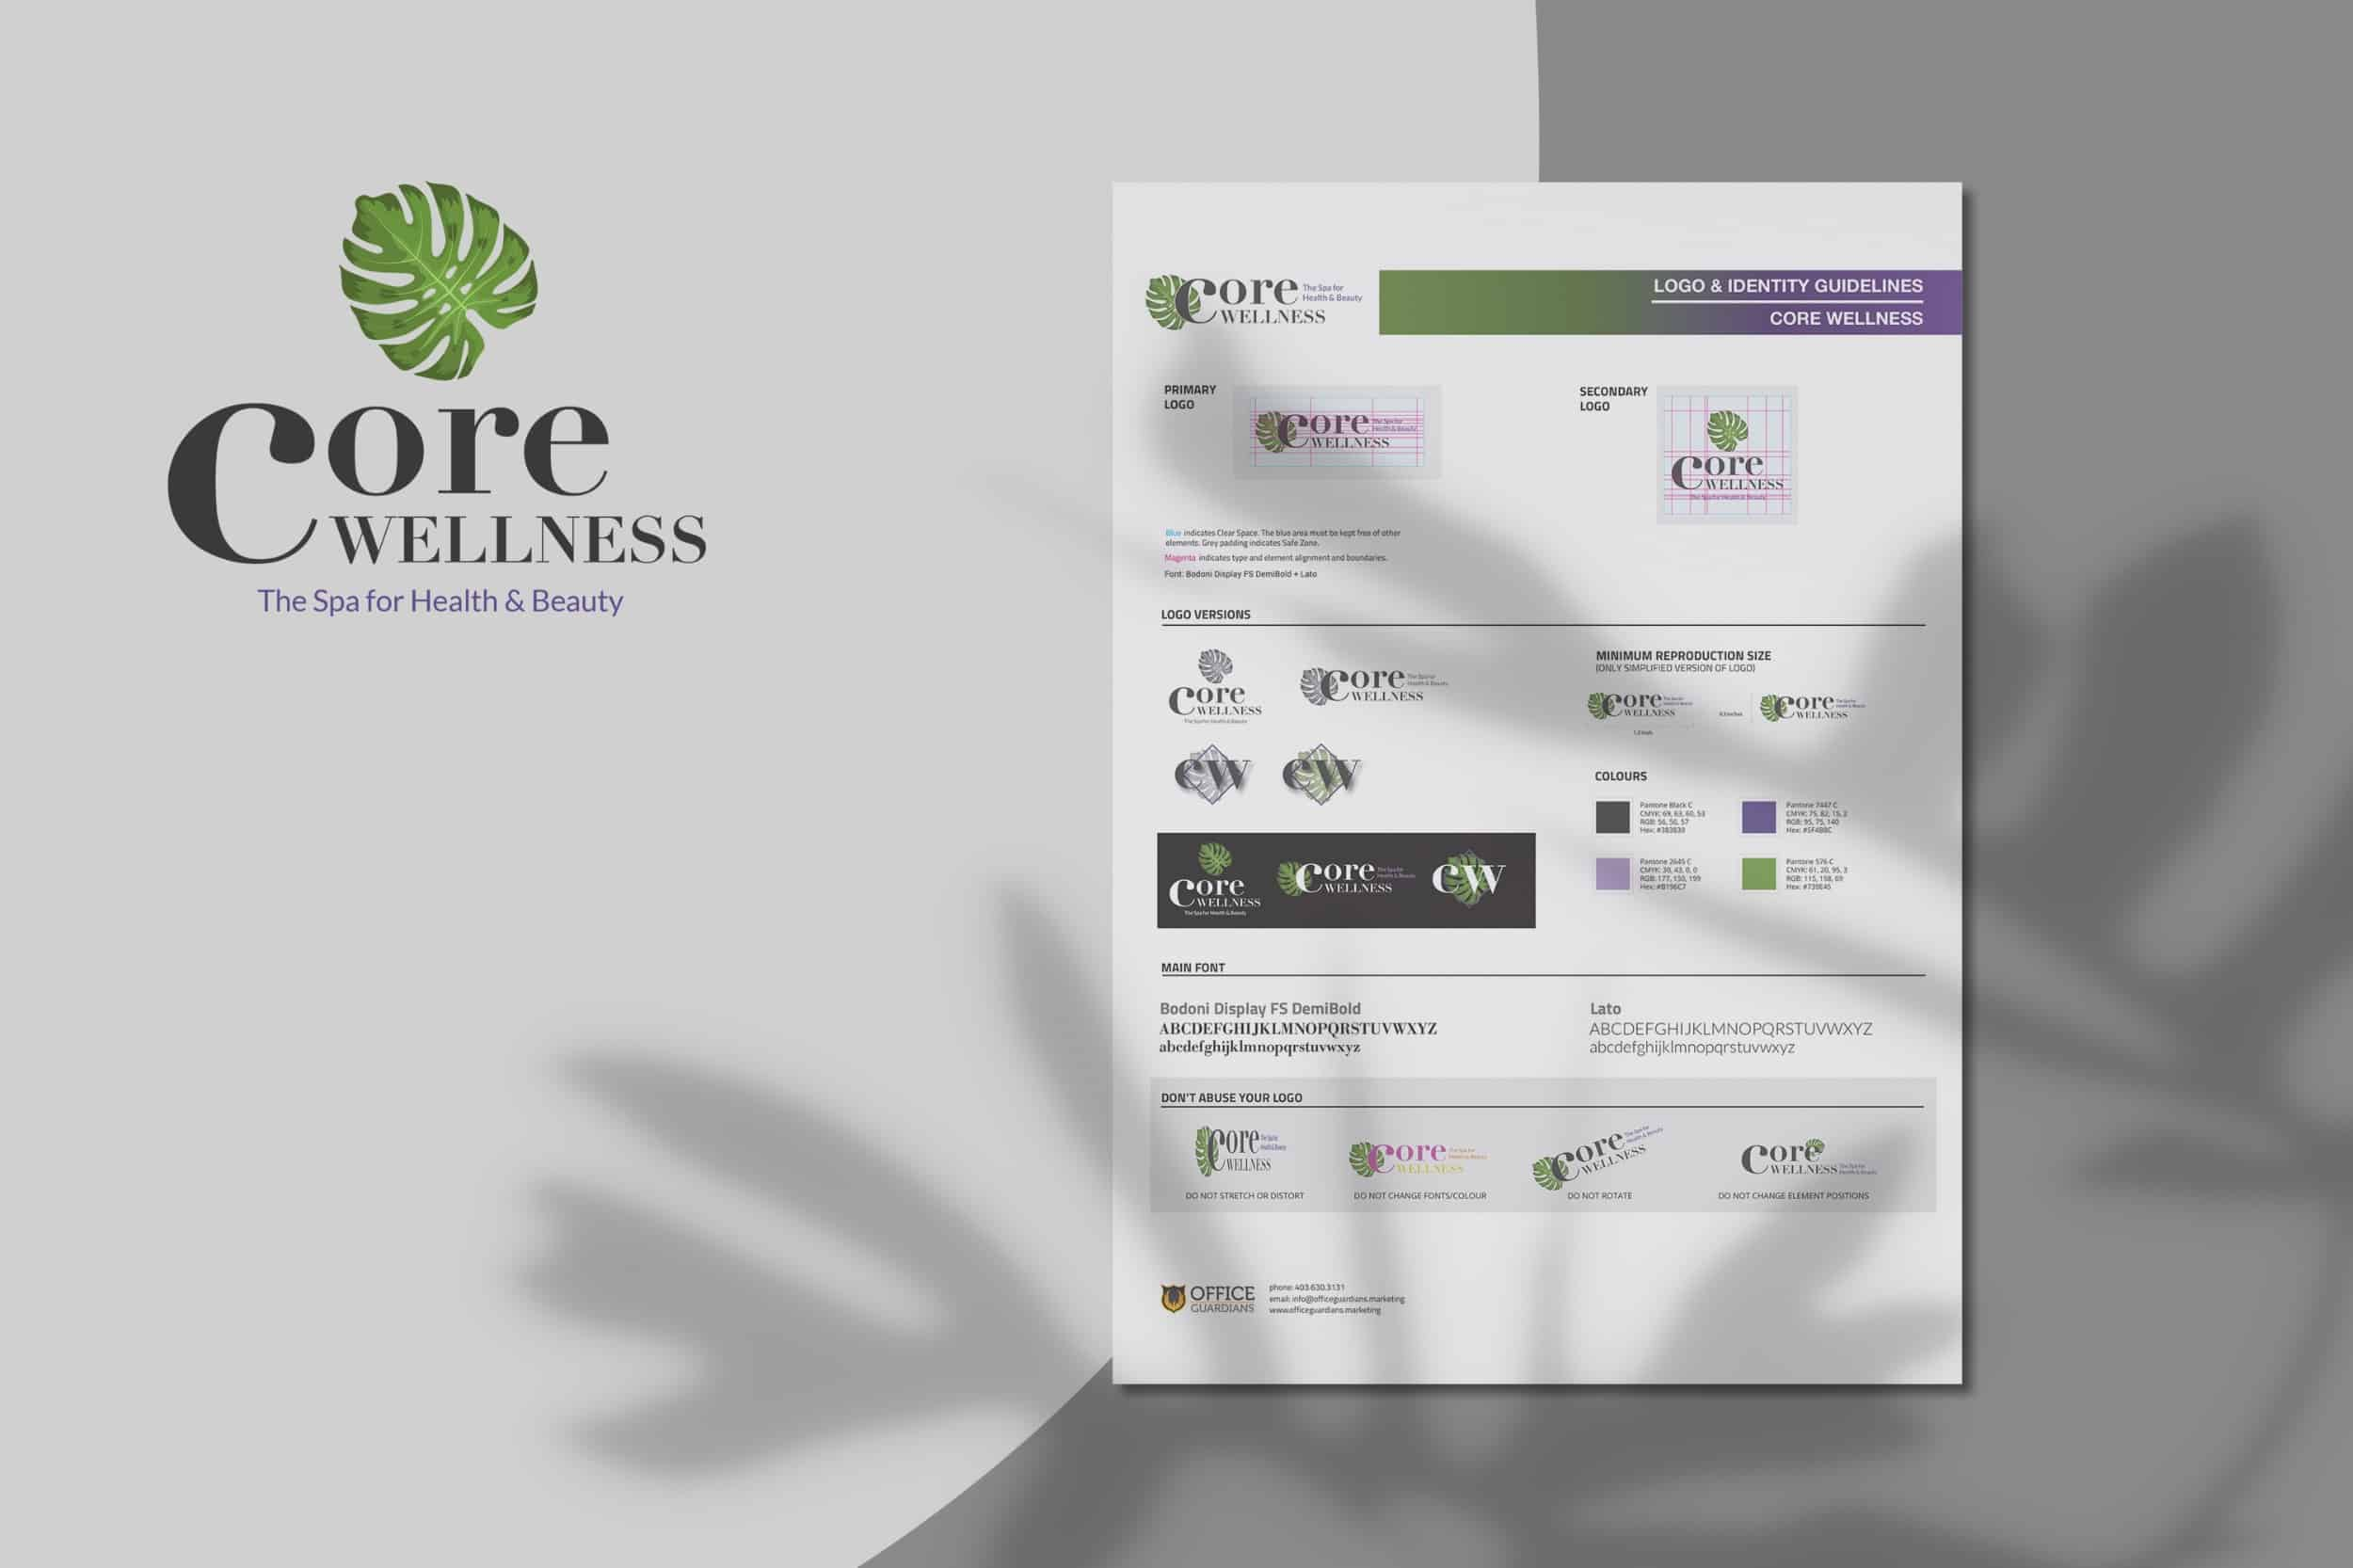 Core Wellness Spa